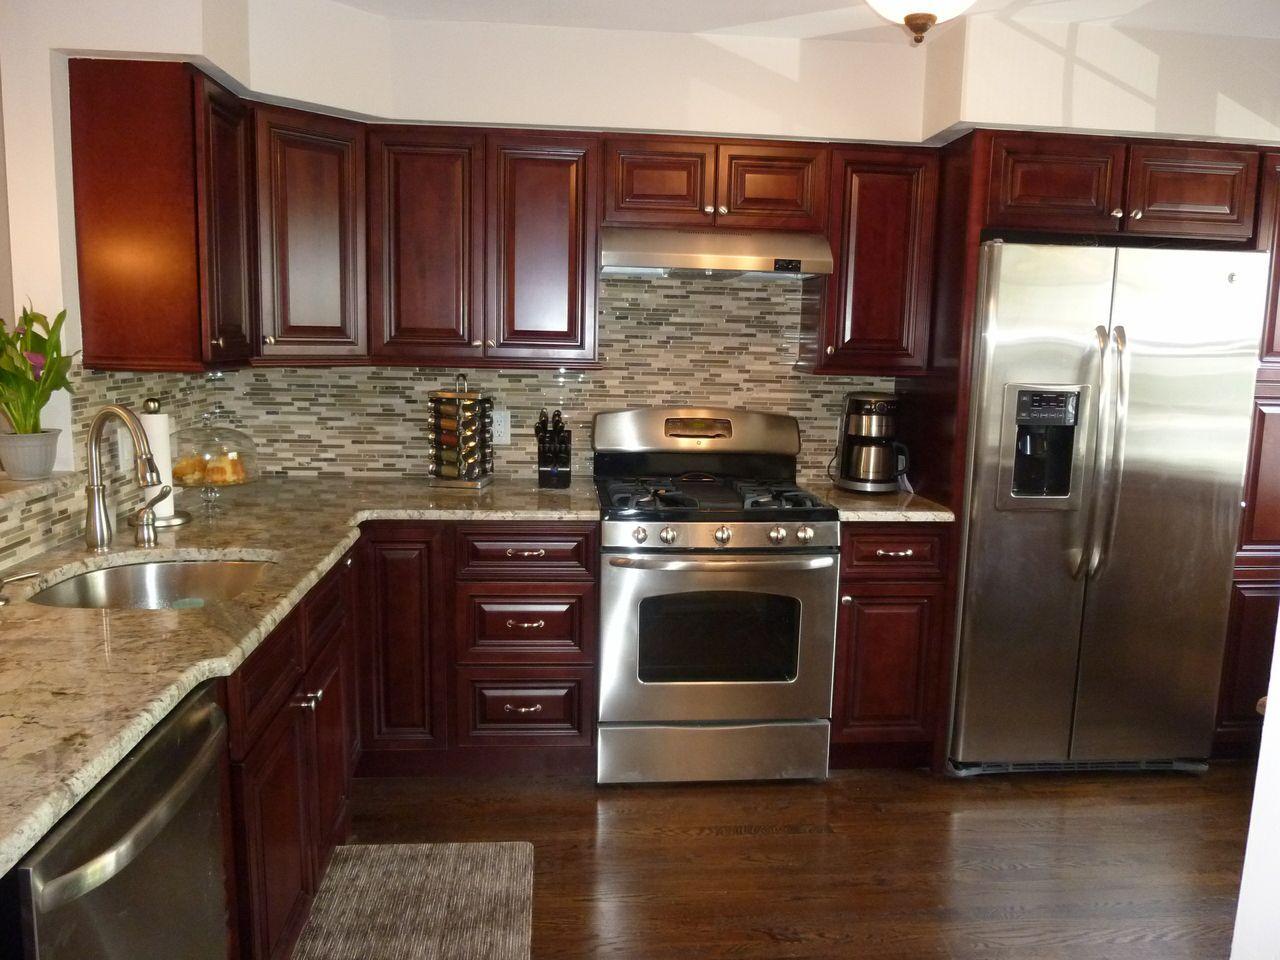 Best Kitchen Gallery: Modern Kitchen Stainless Steel Appliances Granite Counter Tops of Mahogany Kitchen Cabinets on rachelxblog.com